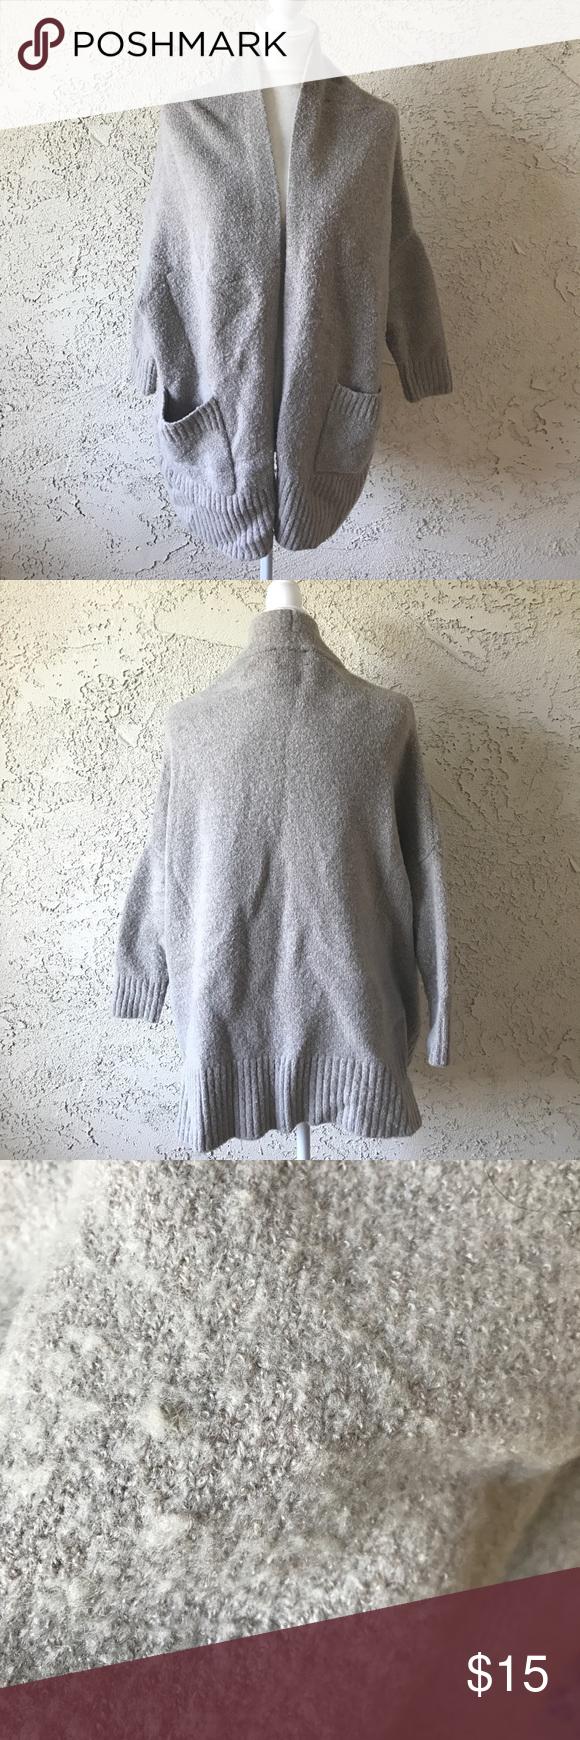 Best Fashion - Cute Cozy Sweaters